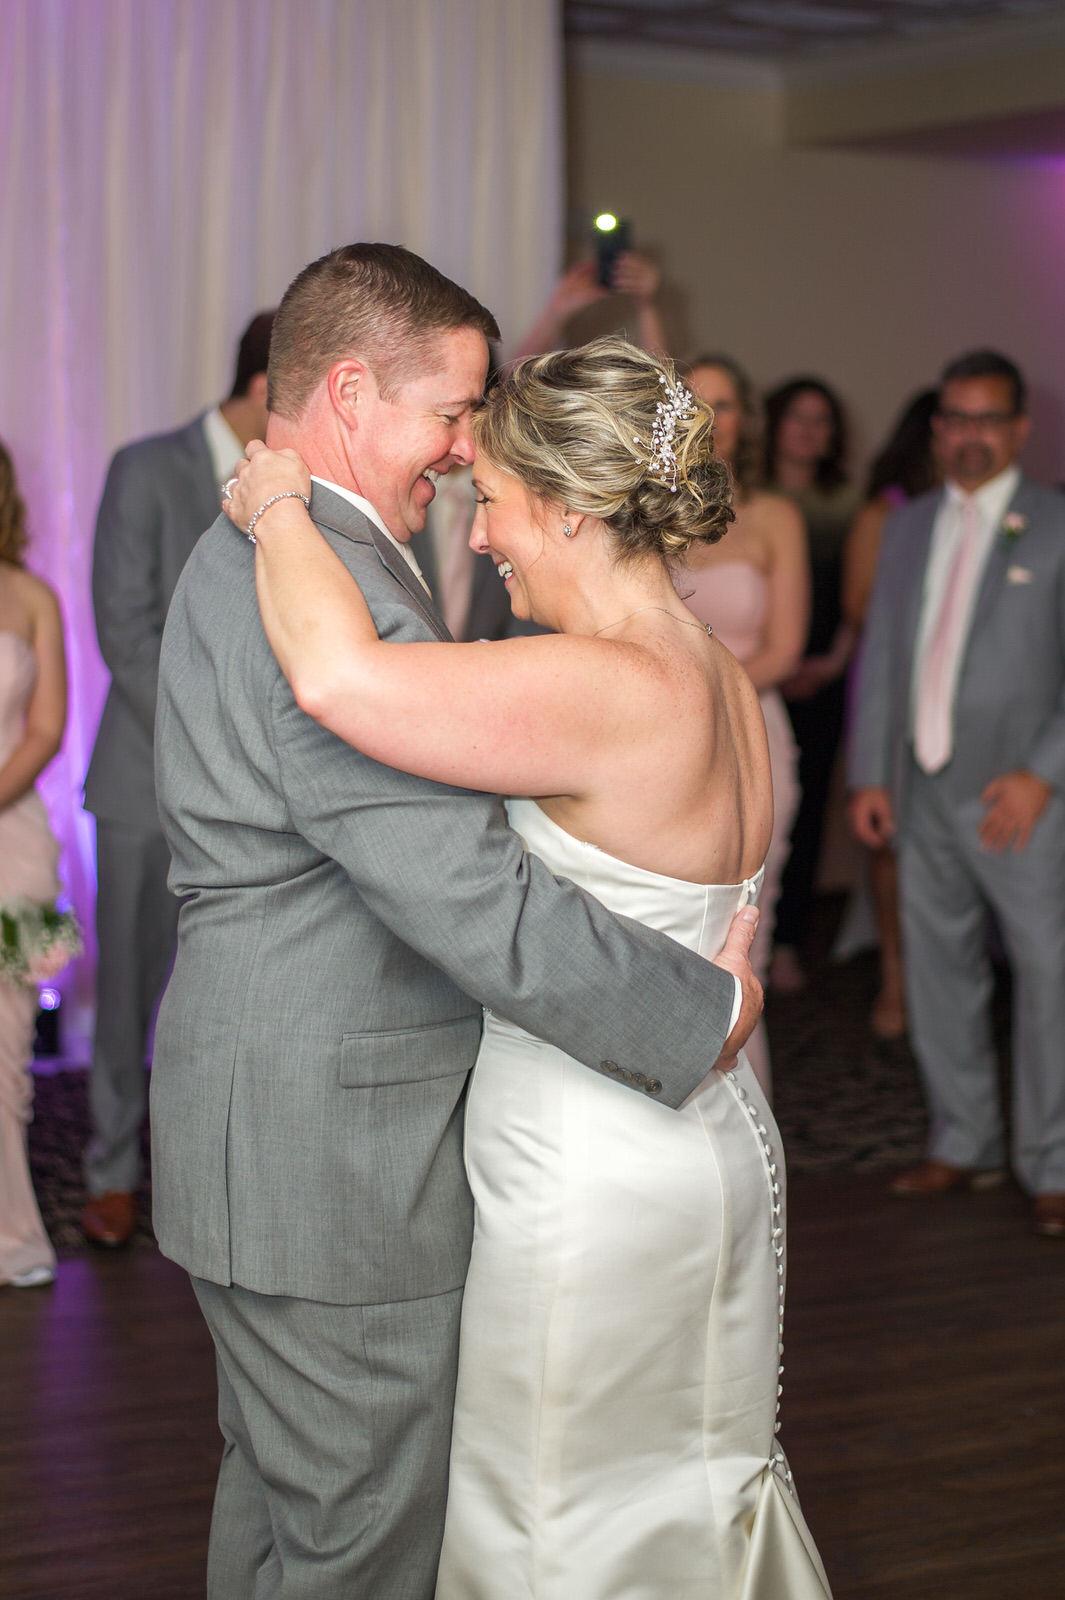 Mike_&_Barbaras_Wedding_3_24_2018-246.jpg